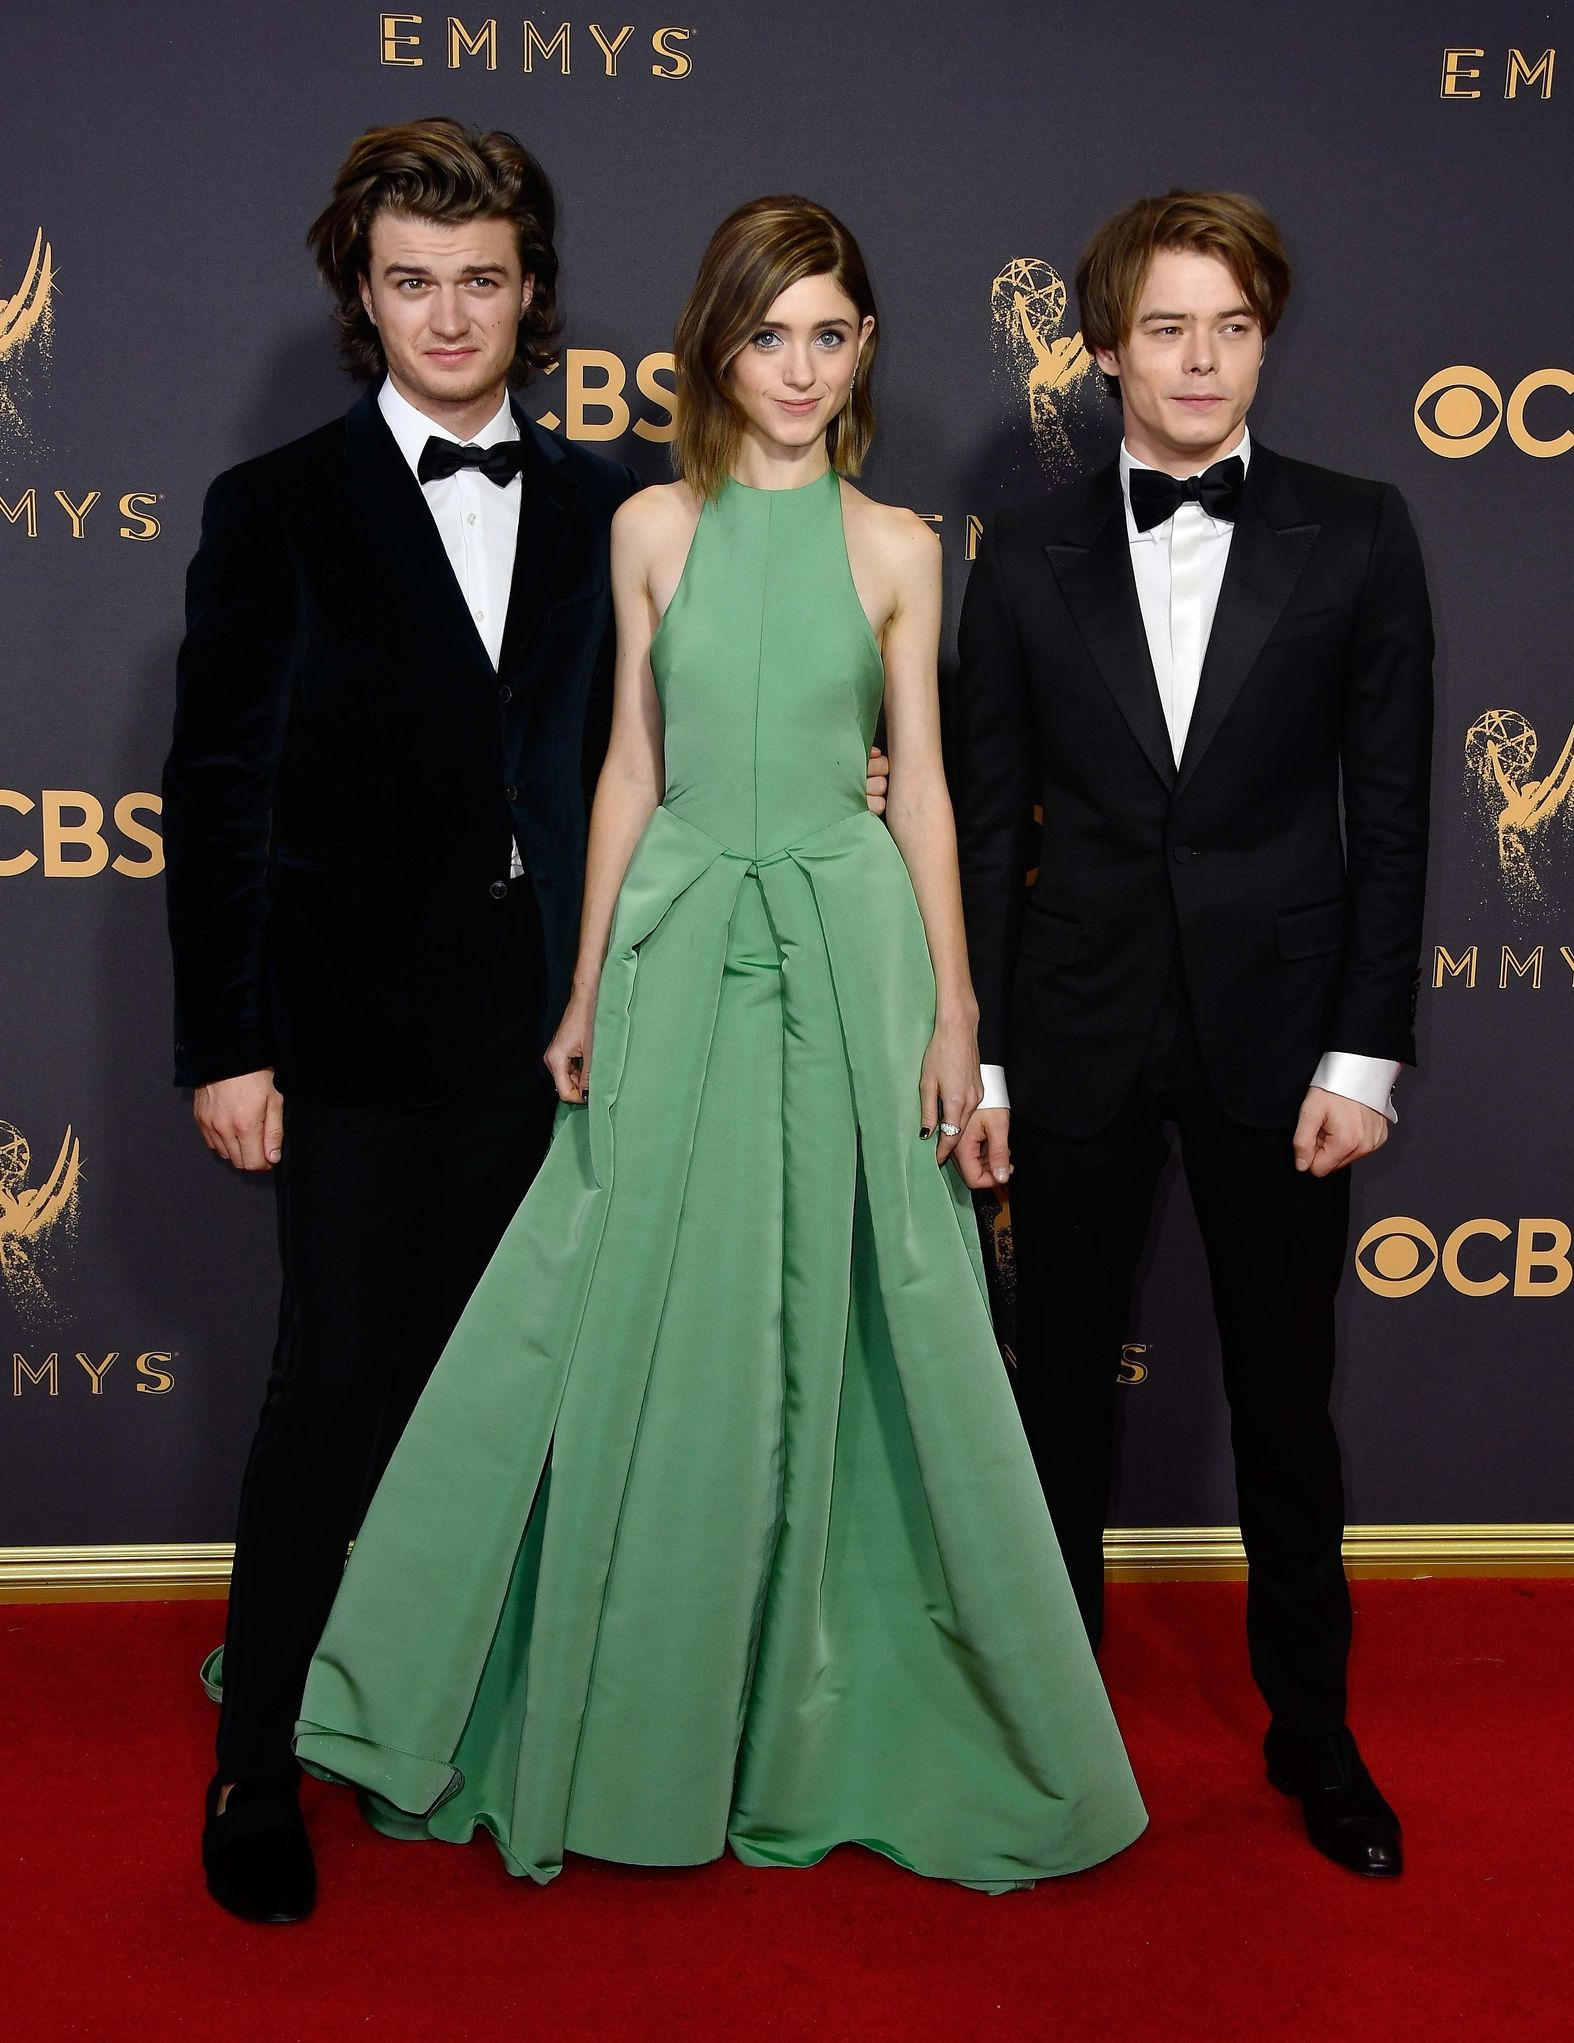 JOE KEERY, NATALIA DYER, AND CHARLIE HEATON Getty In Gucci (Heaton) at Emmys